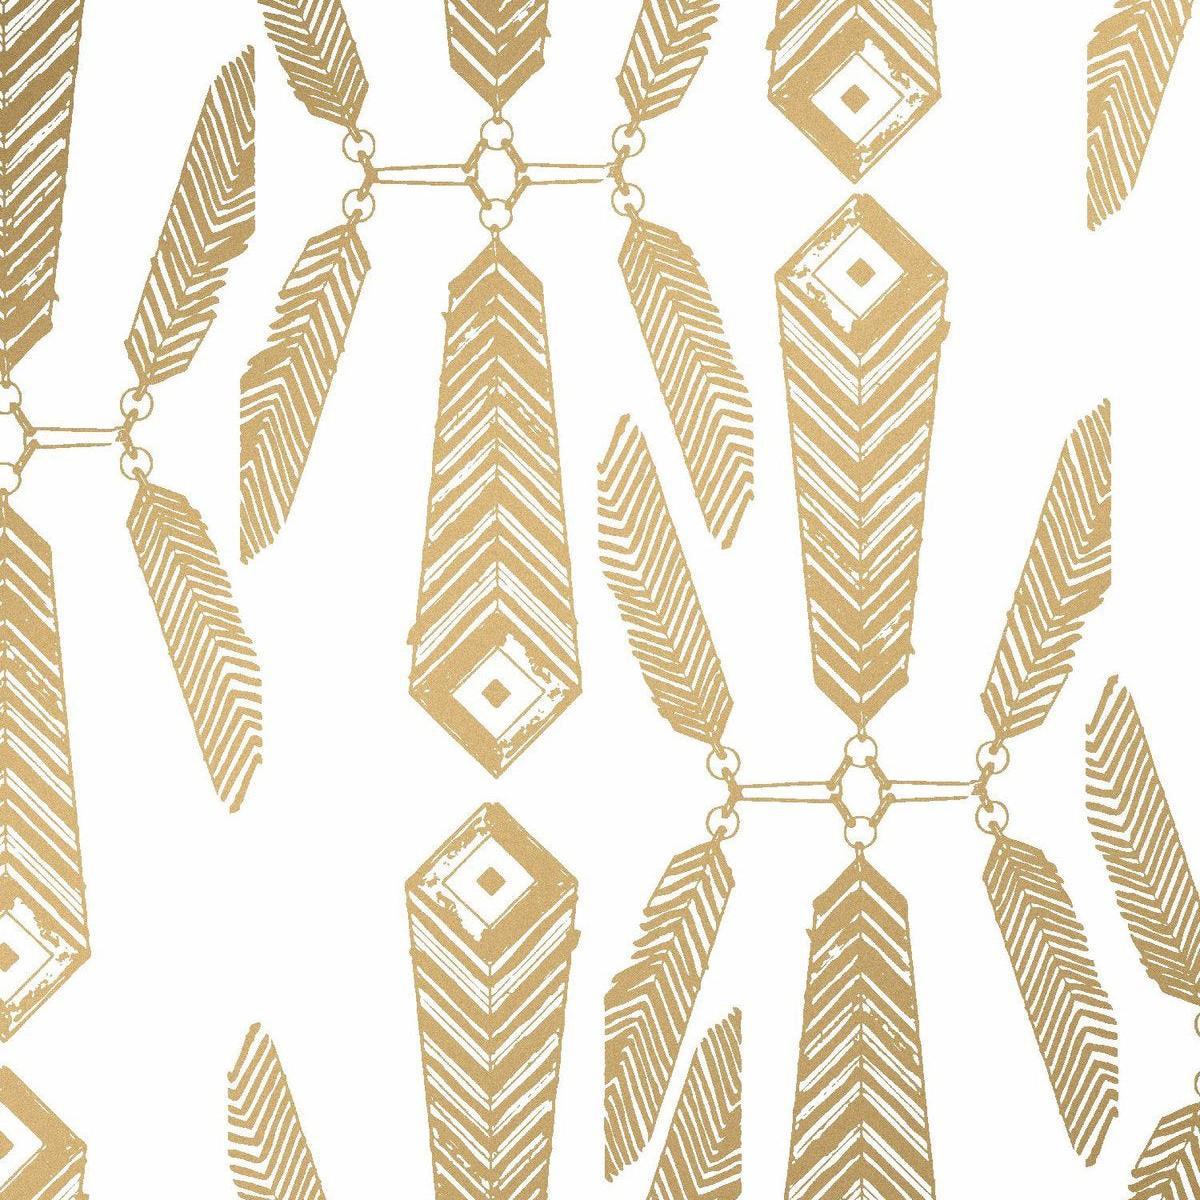 Indian Summer Designer Wallpaper in Sphinx 'Metallic Gold on Soft White'